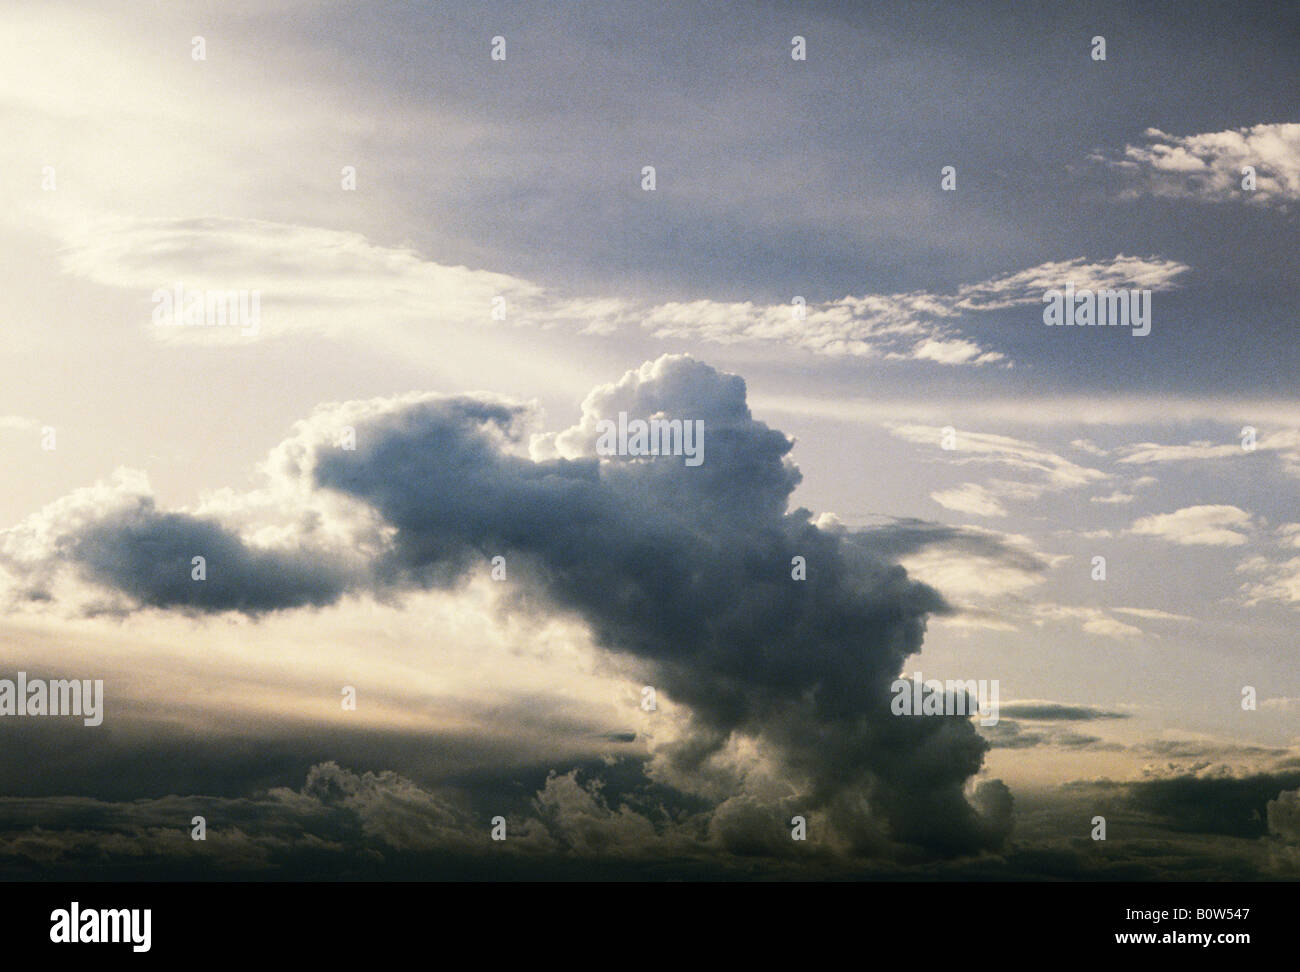 Dramatic Sky Dark Clouds Sandra Baker - Stock Image